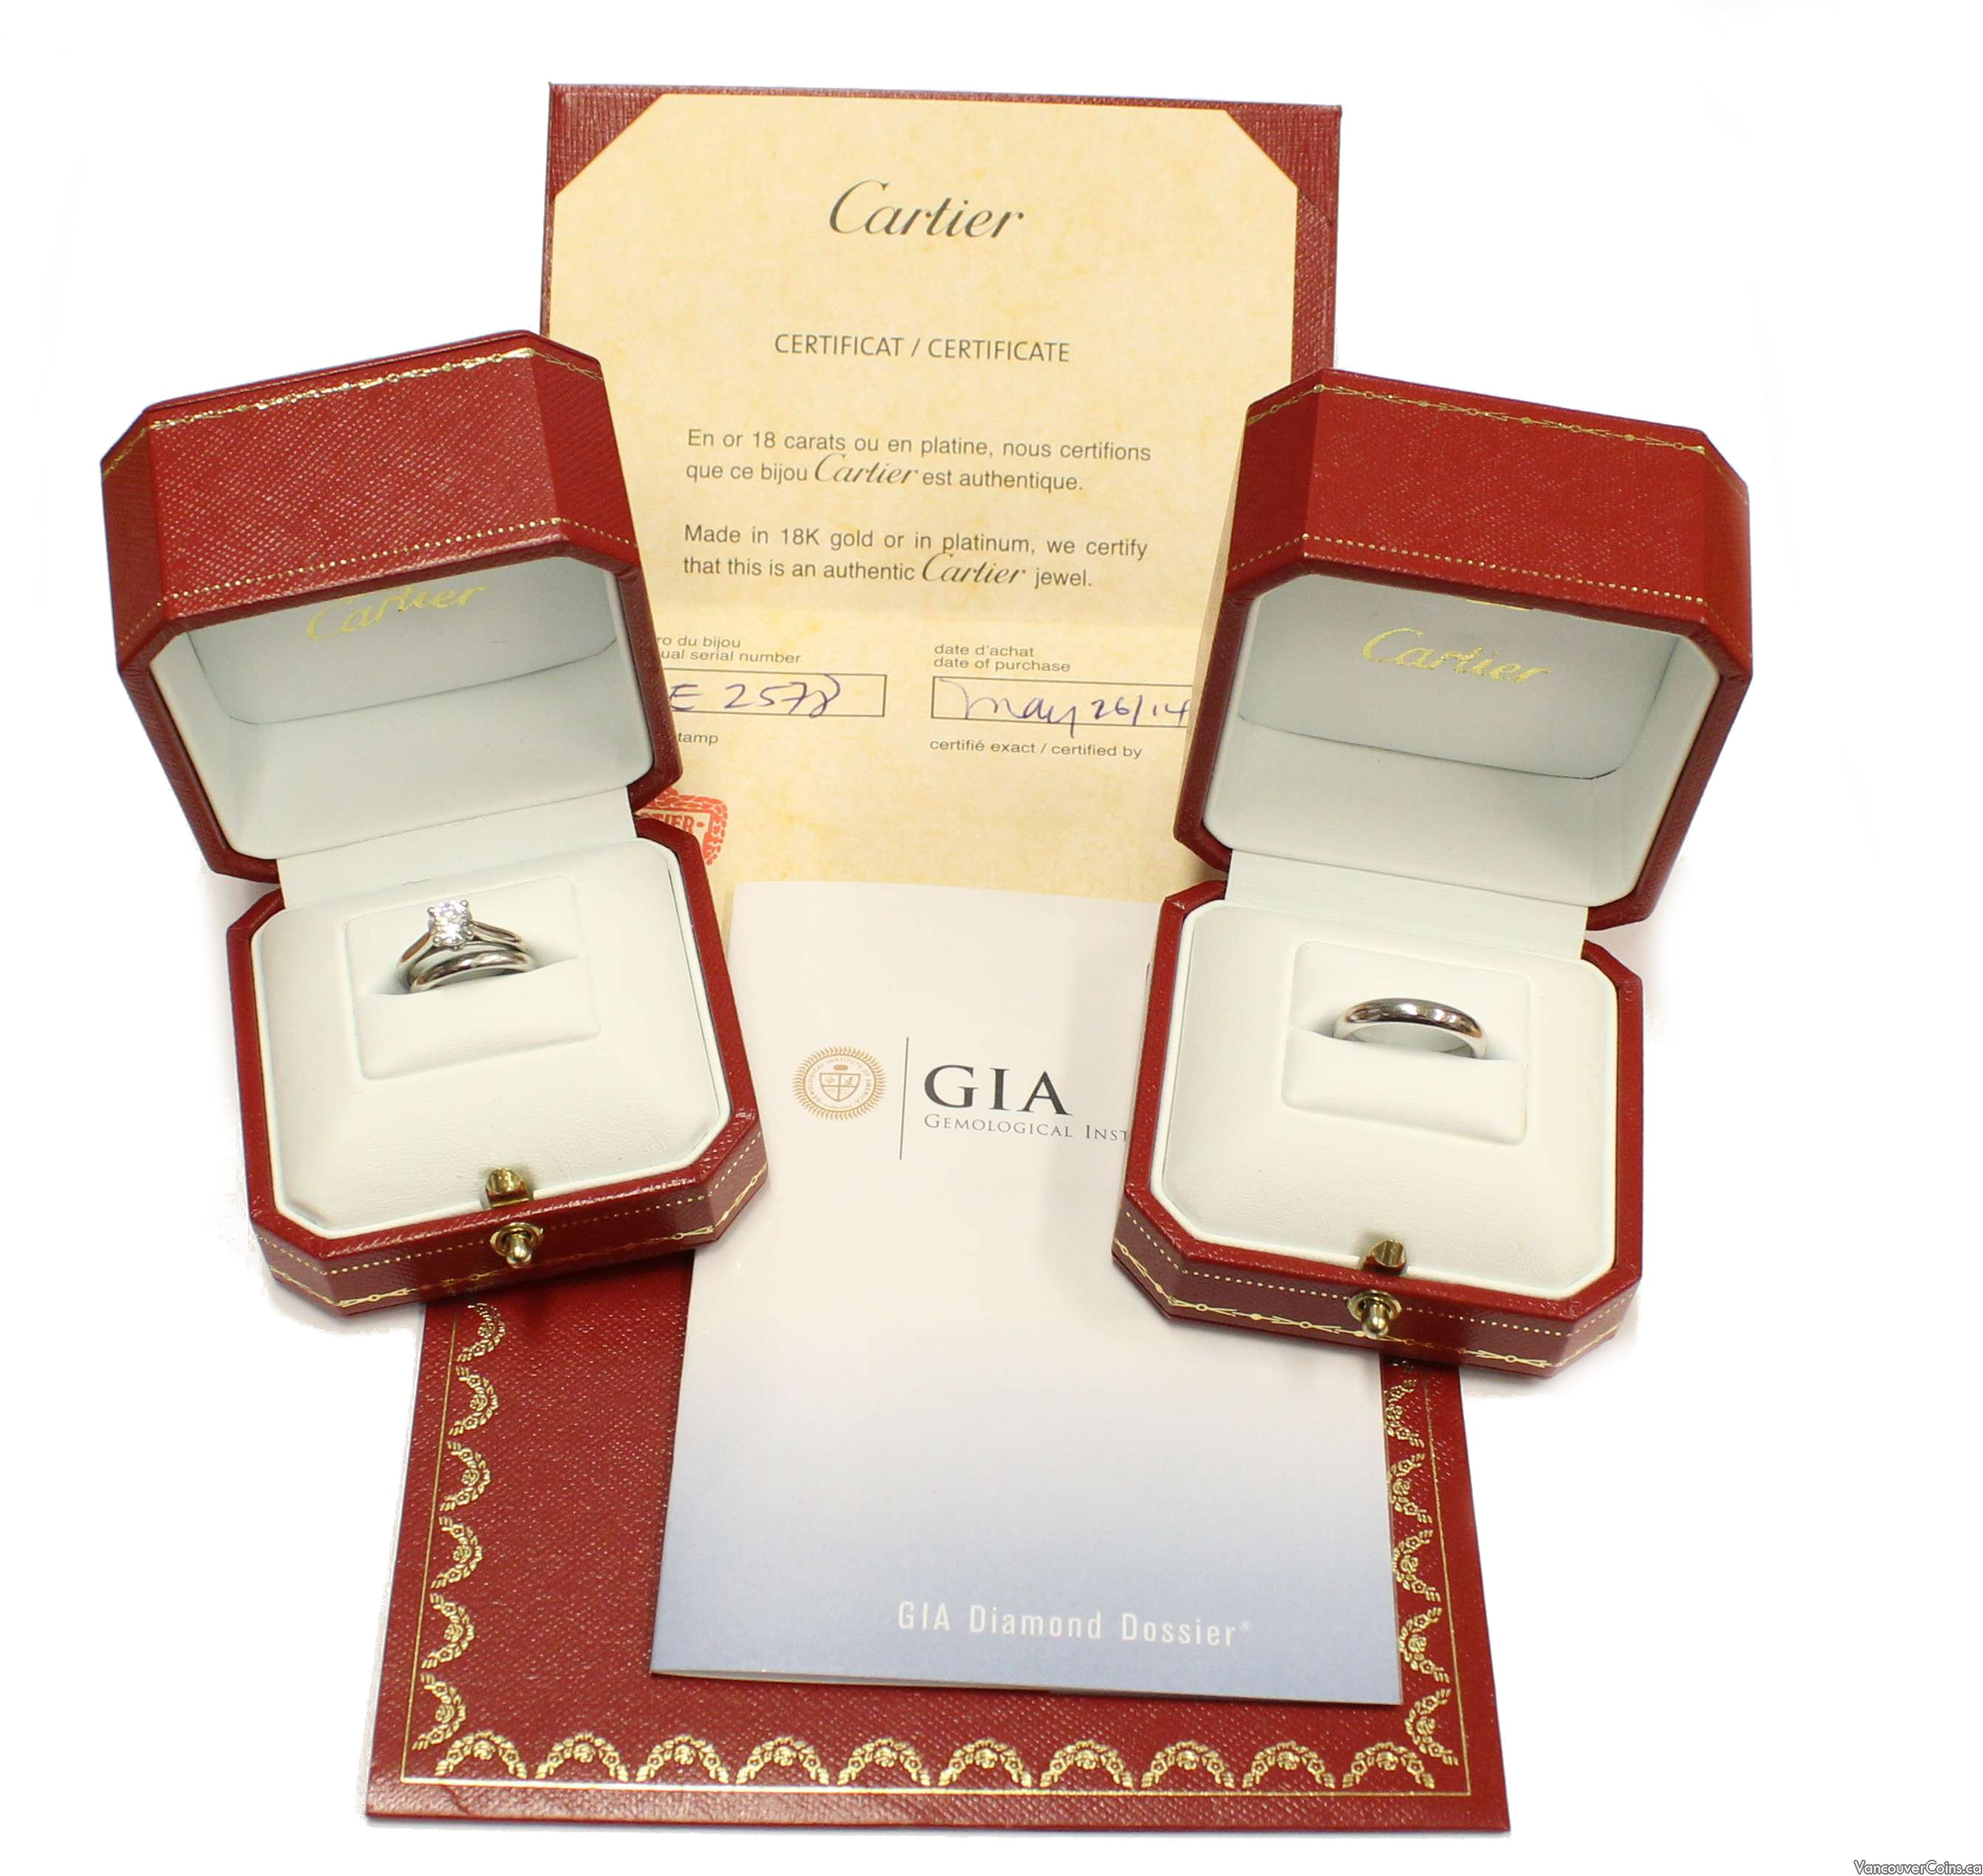 Cartier 950 platinum GIA cert 0.73ct H VVS1 diamond solitaire & Wedding bands